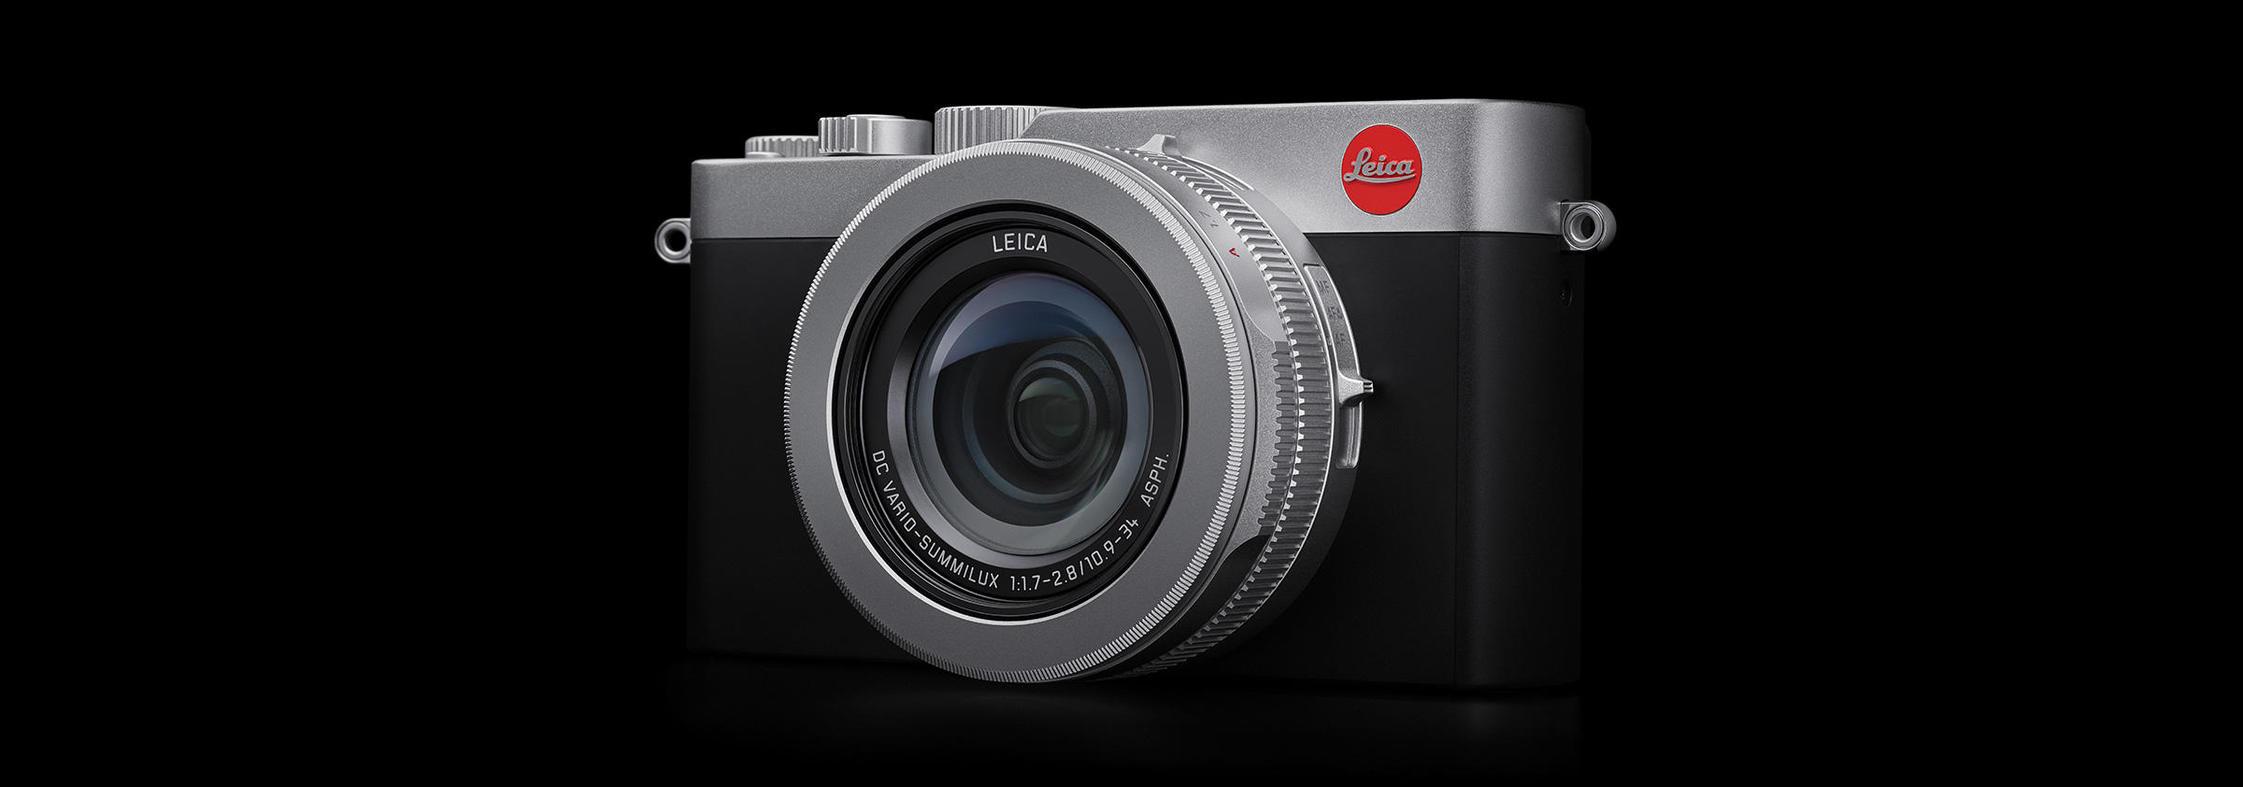 Leica-D-Lux-7-on-black-|-Header-2400x840_teaser-2400x787